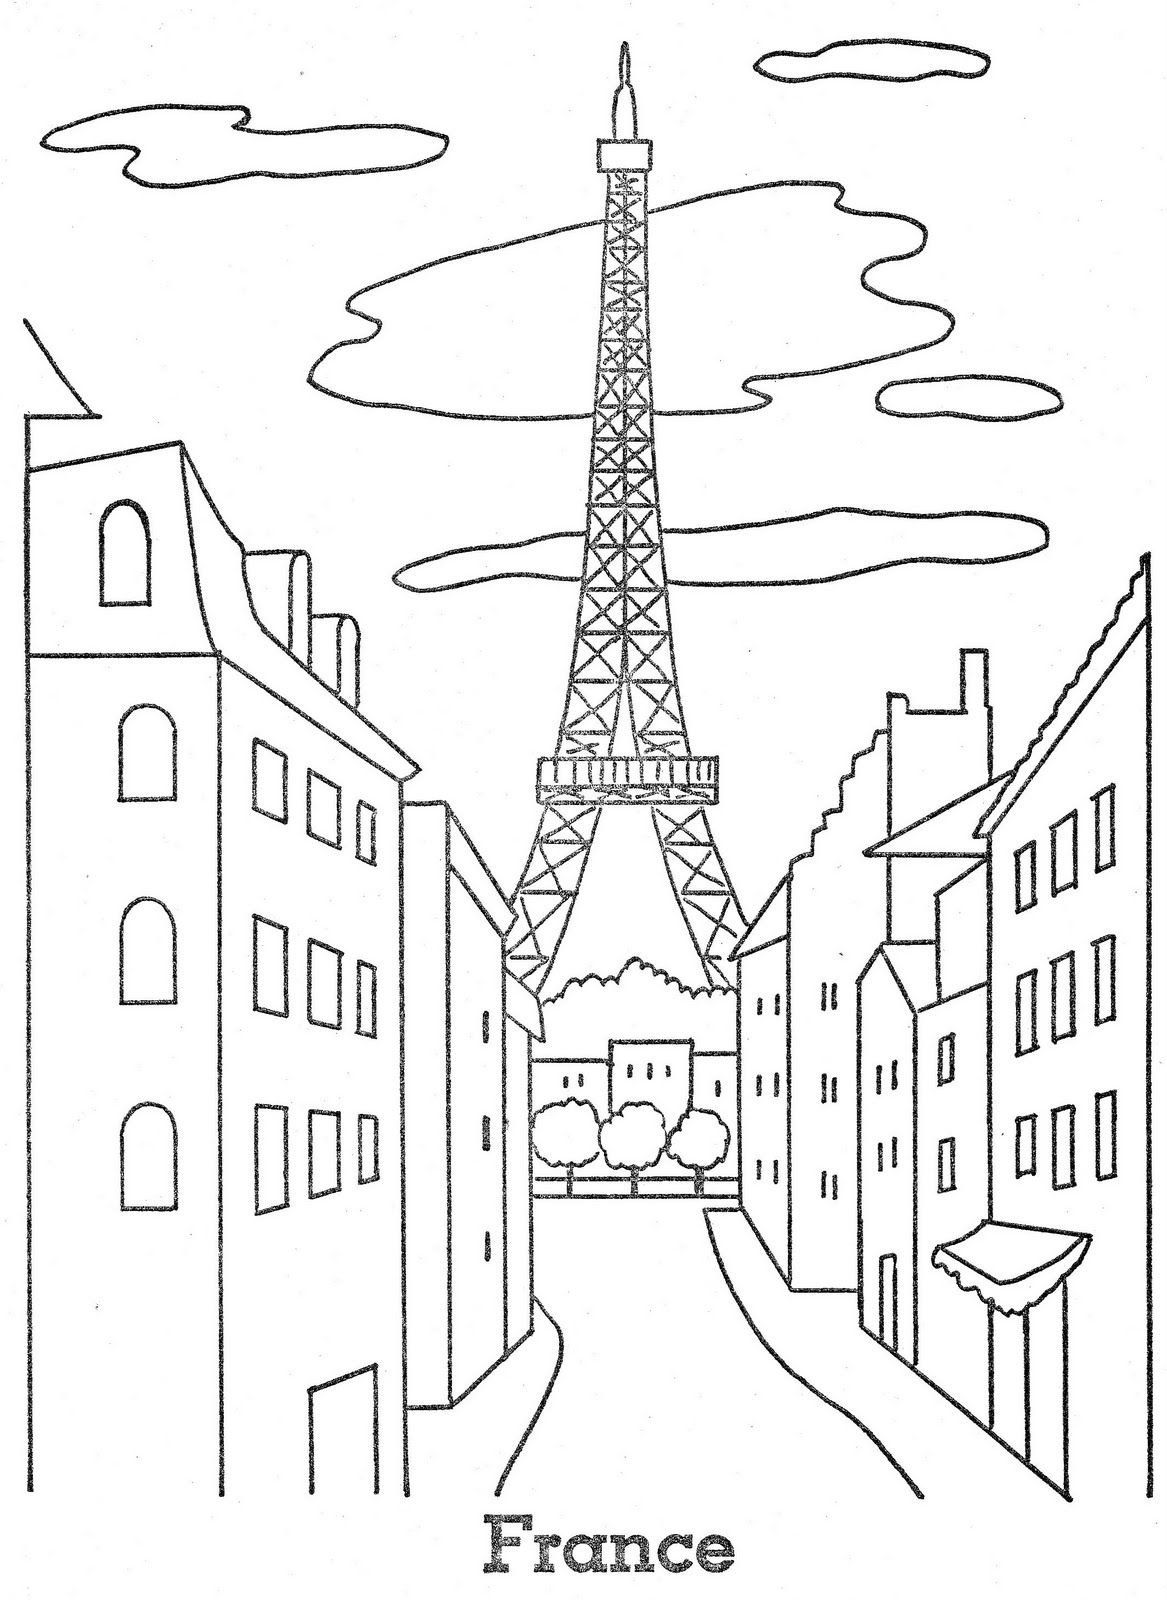 Tour Eiffel | Siglo XIX 1ª mitad | Pinterest | Siglo xix